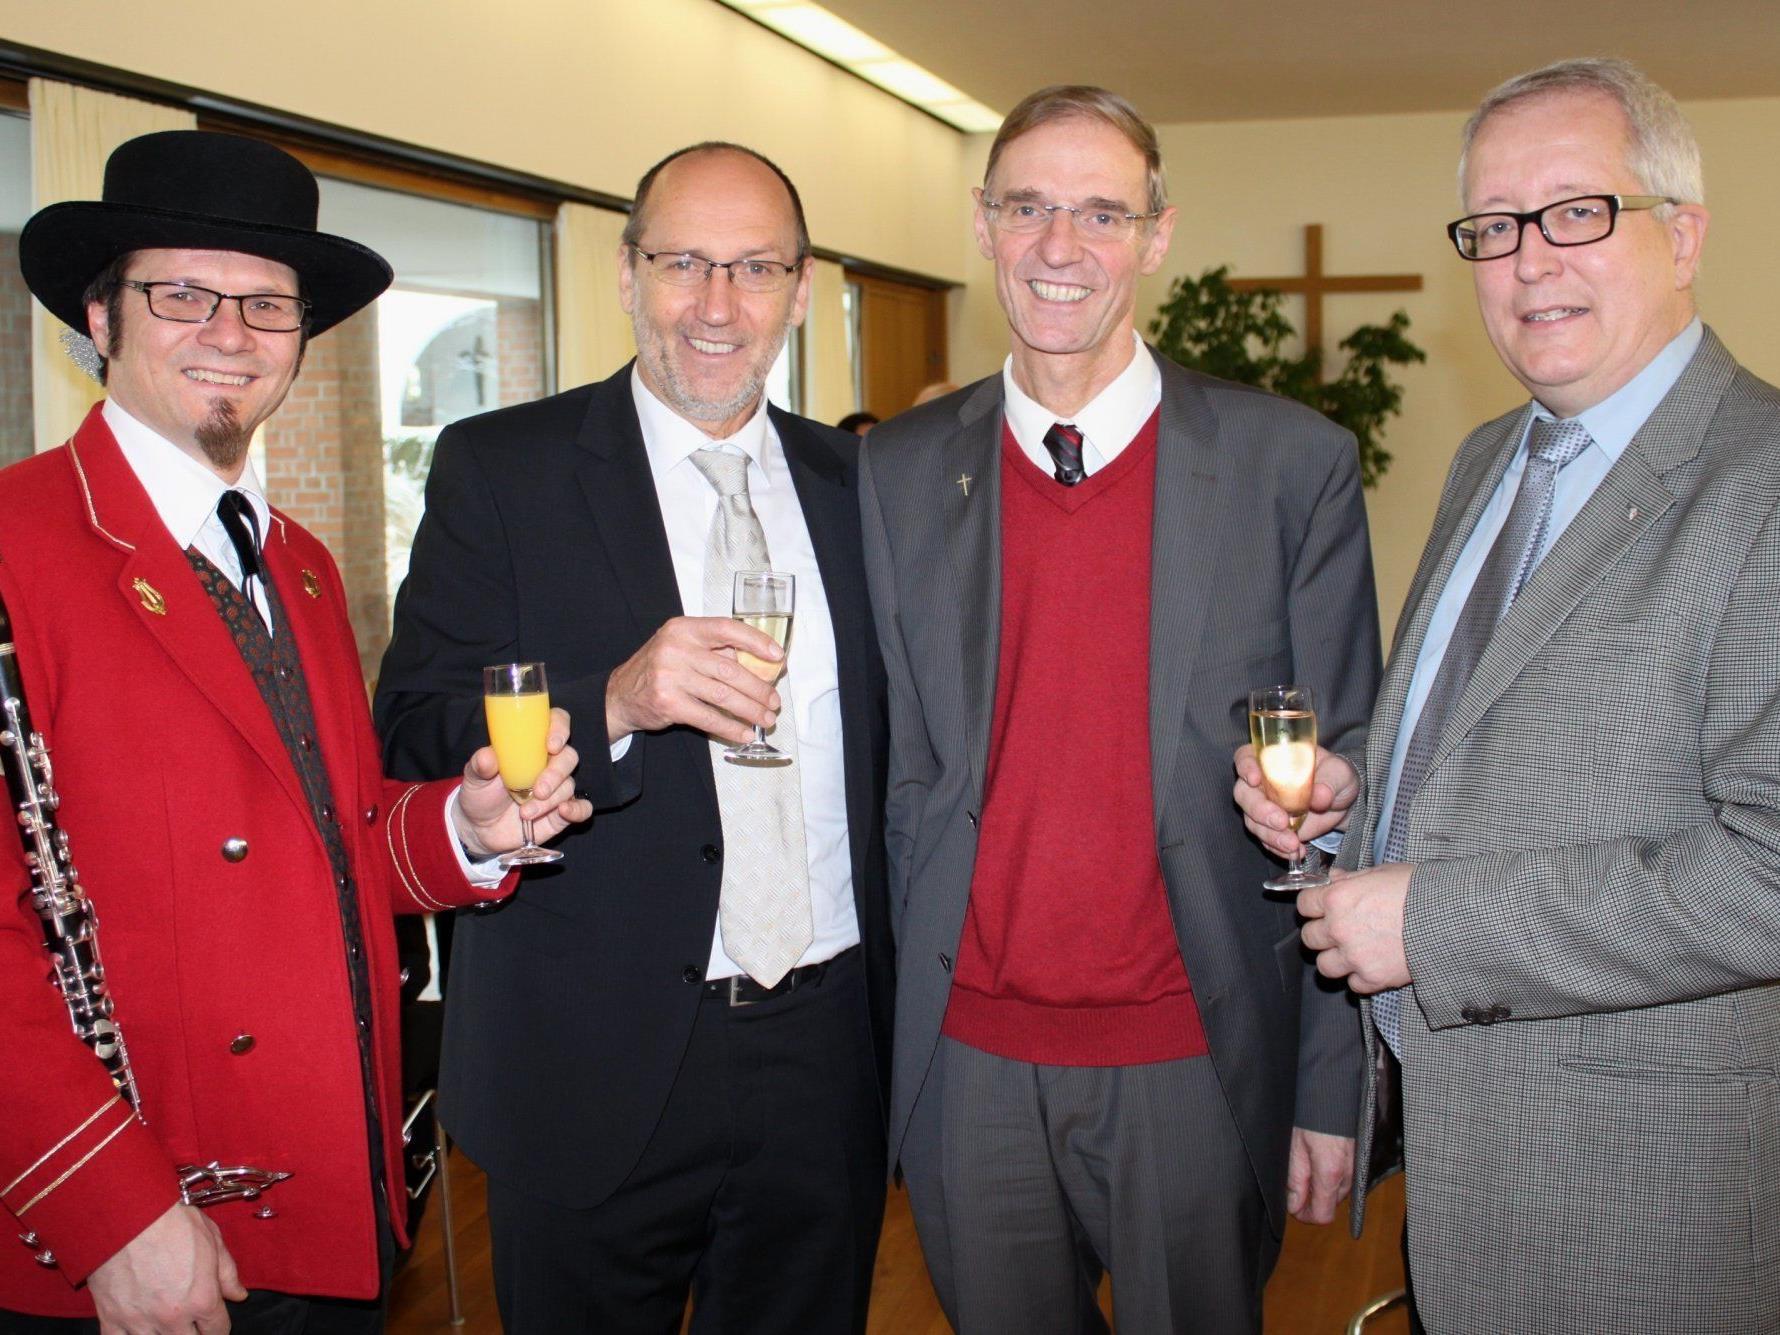 Ein Prosit auf 2012 – Helmut Immler, Bgm. Xaver Sinz, Pfarrer Gerhard Mähr, Vize-Bgm. Michael Simma.